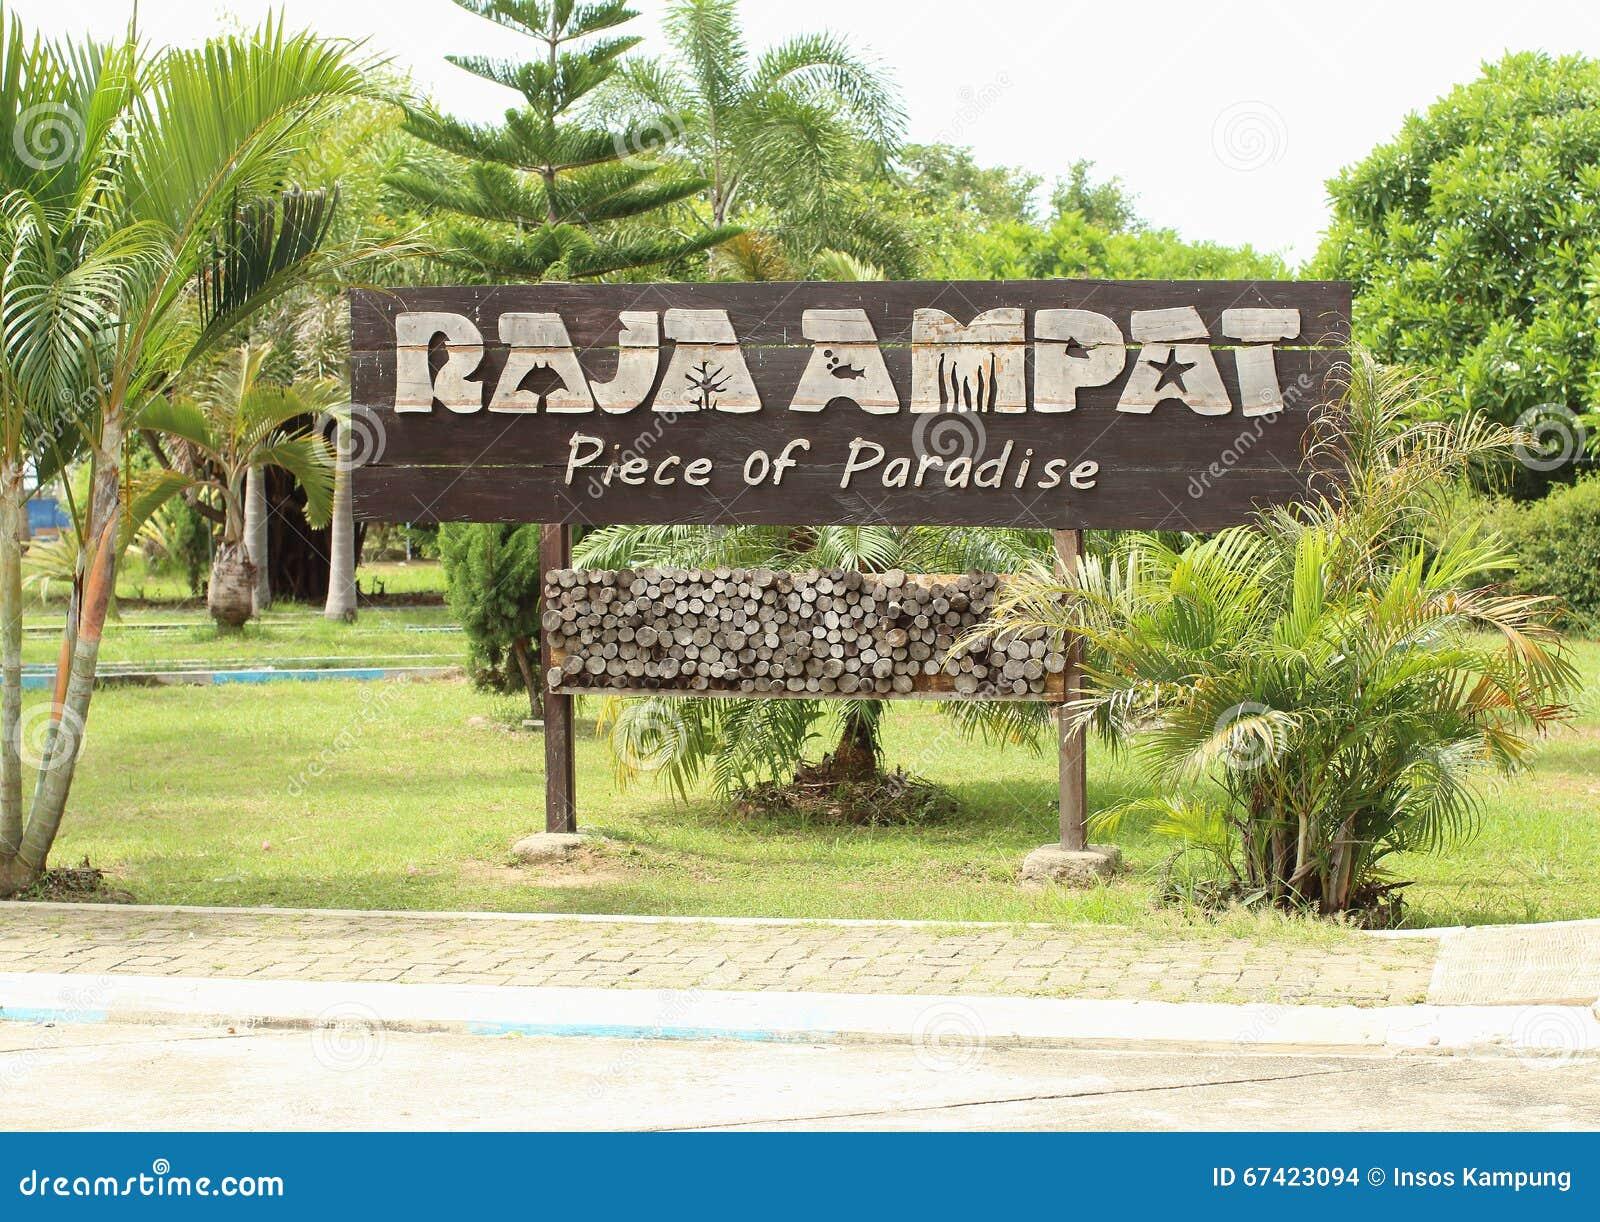 Raja Ampat Piece of Paradise